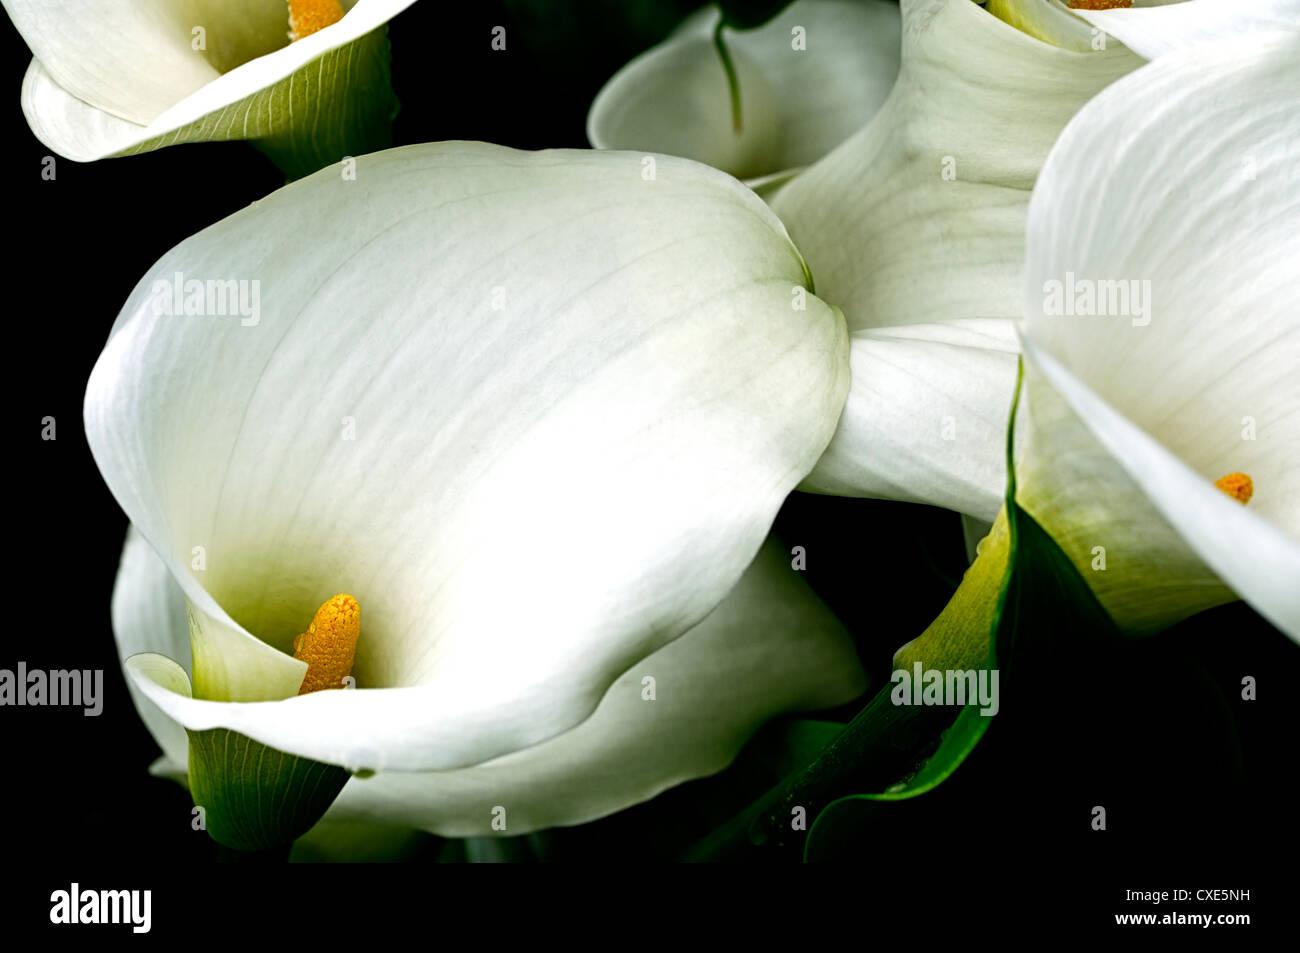 zantedeschia aethiopica crowborough arum calla lily lilies closeup white flowers petals spathes bog plants perennials Stock Photo